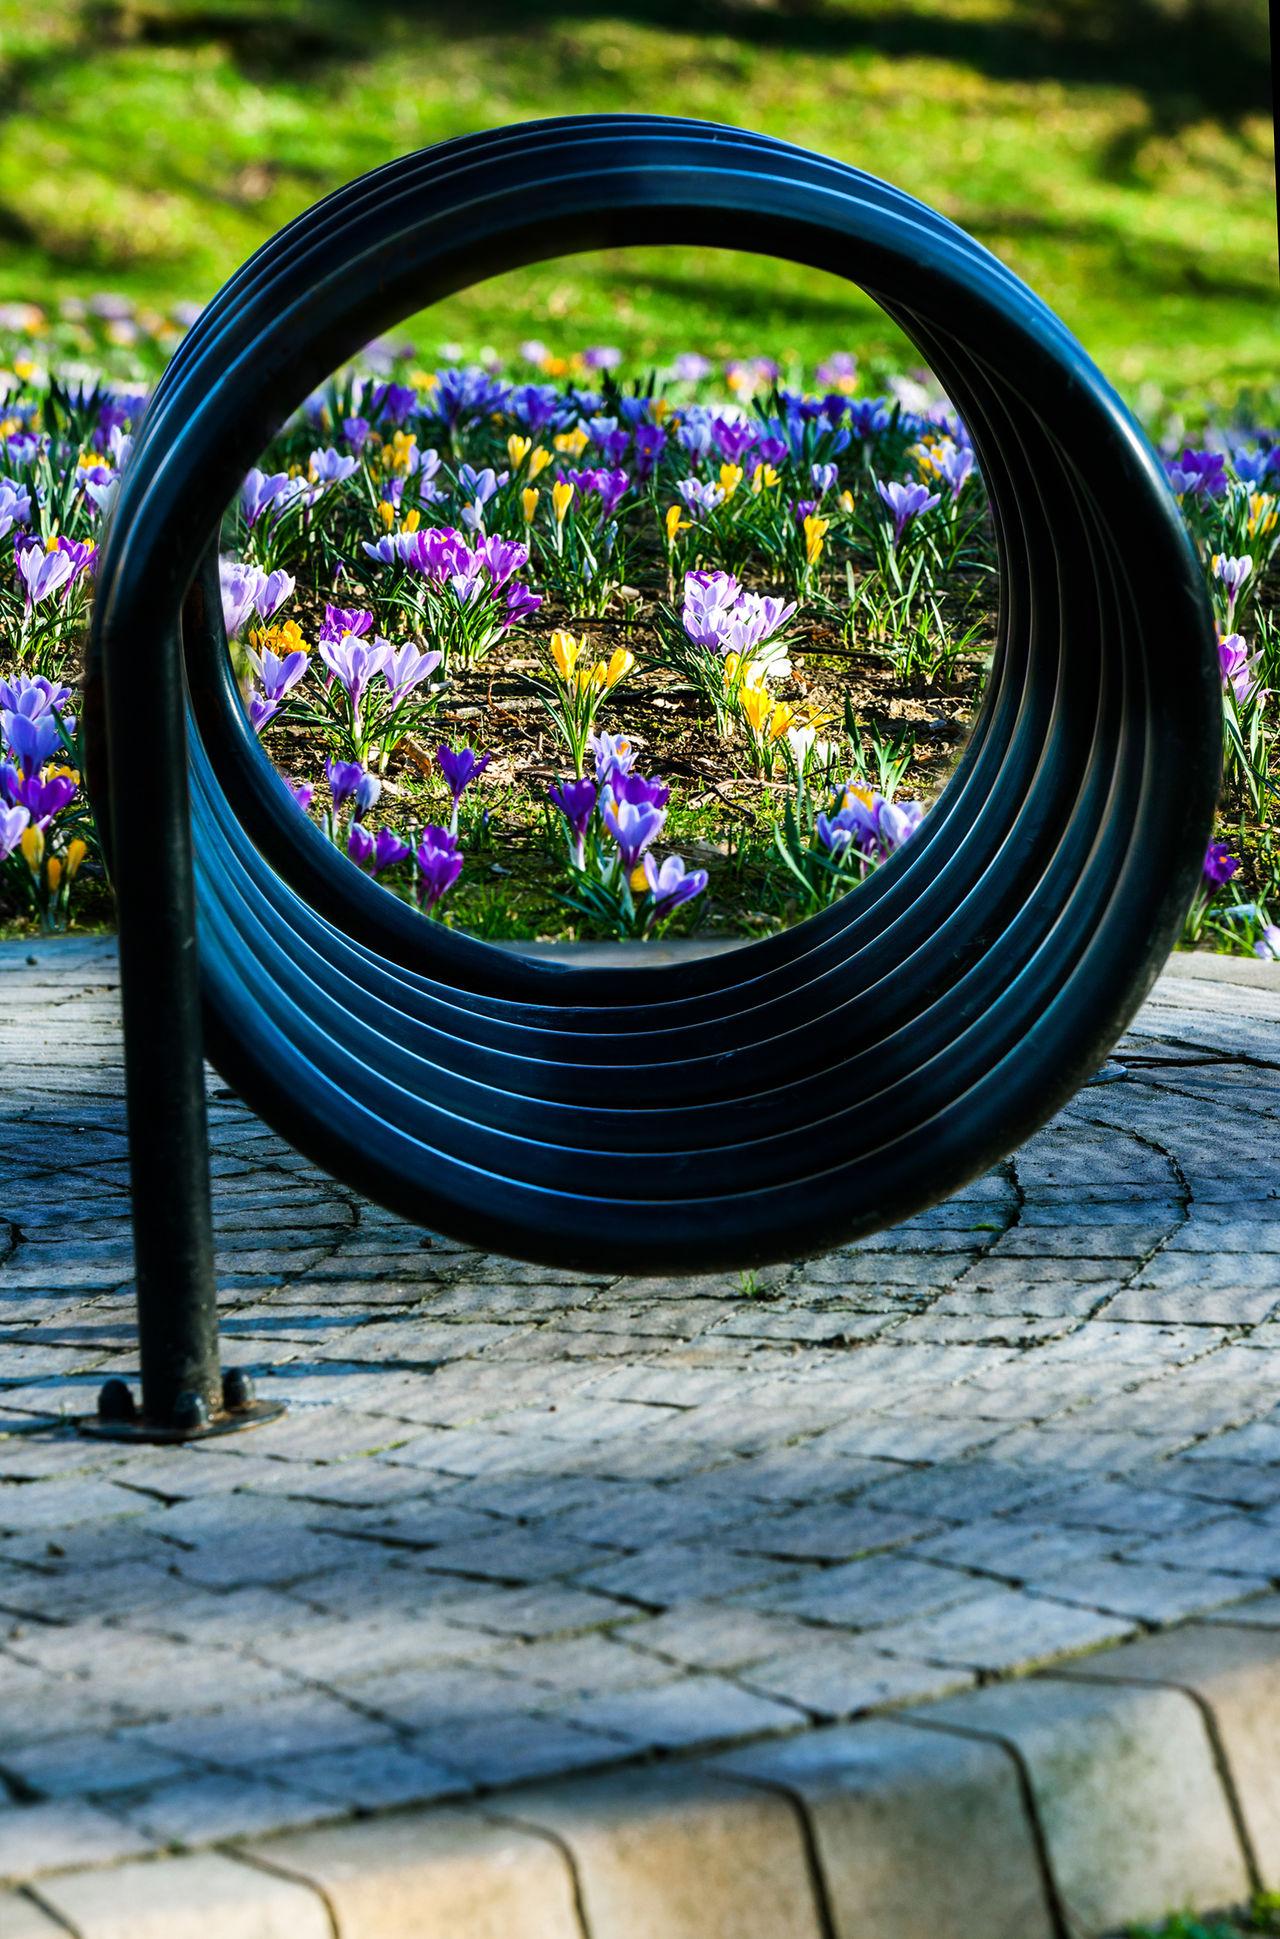 Bike Stand Close-up Coil Spring Crocus Crocus Flavus #wildflowers #guadarrama #primavera #spring #flores #nature #mountain Crocuses Spring Cycle Rack Day Flower Fragility Jastrzębie - Zdrój No People Outdoors P Plant Spring Springtime Whell